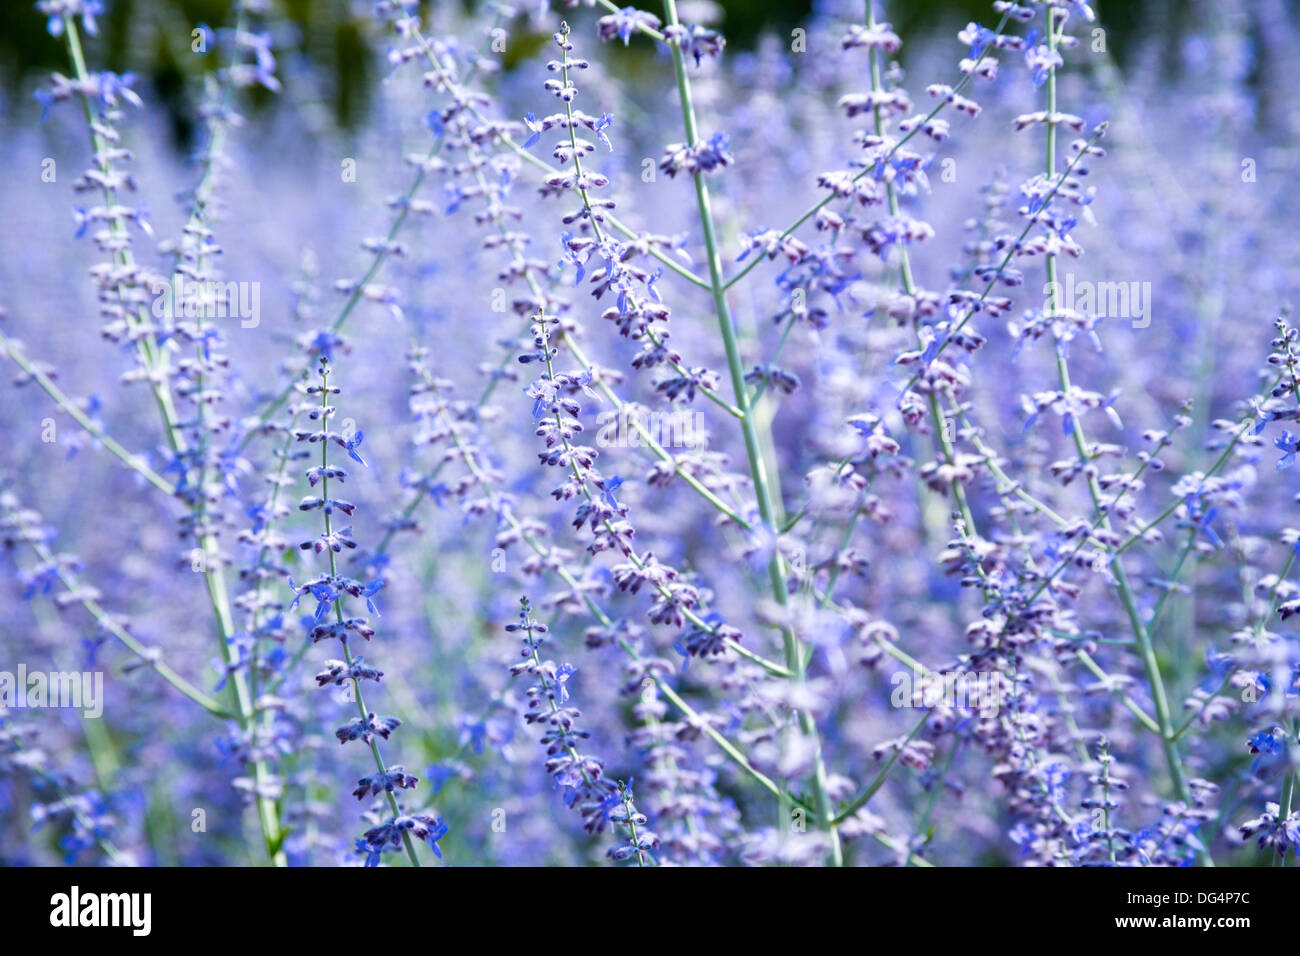 Lavender Garden Chateau France Horticulture Plants   Stock Image